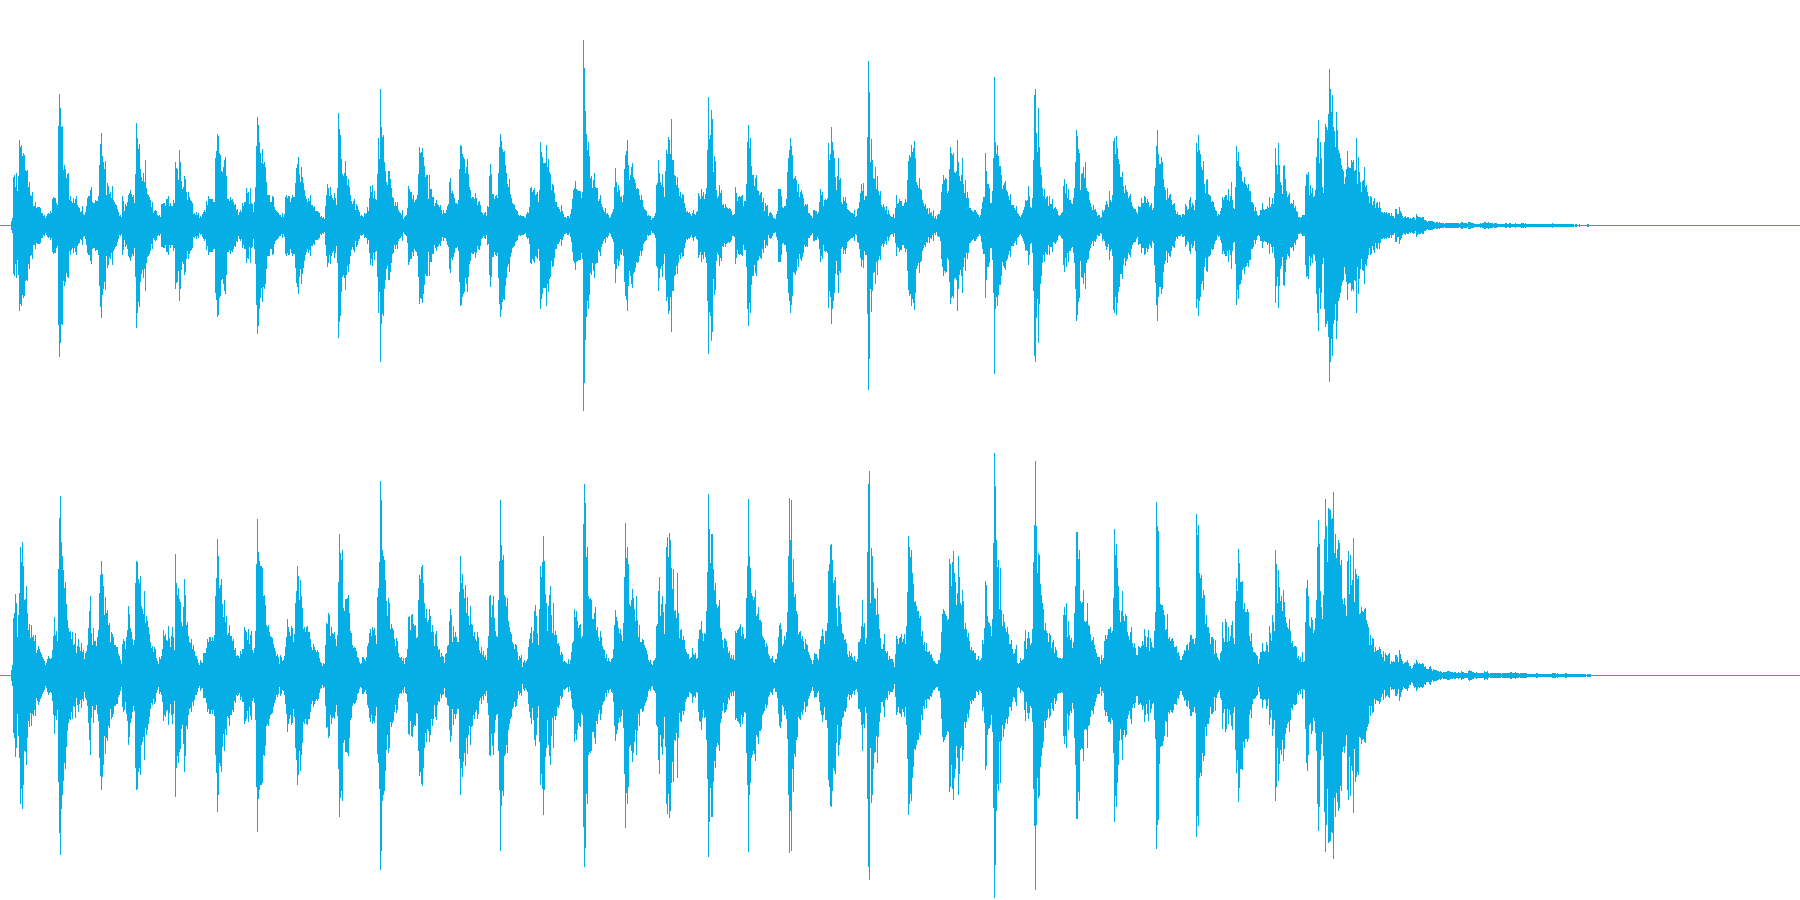 Xmasに最適トナカイベルのループ音06の再生済みの波形